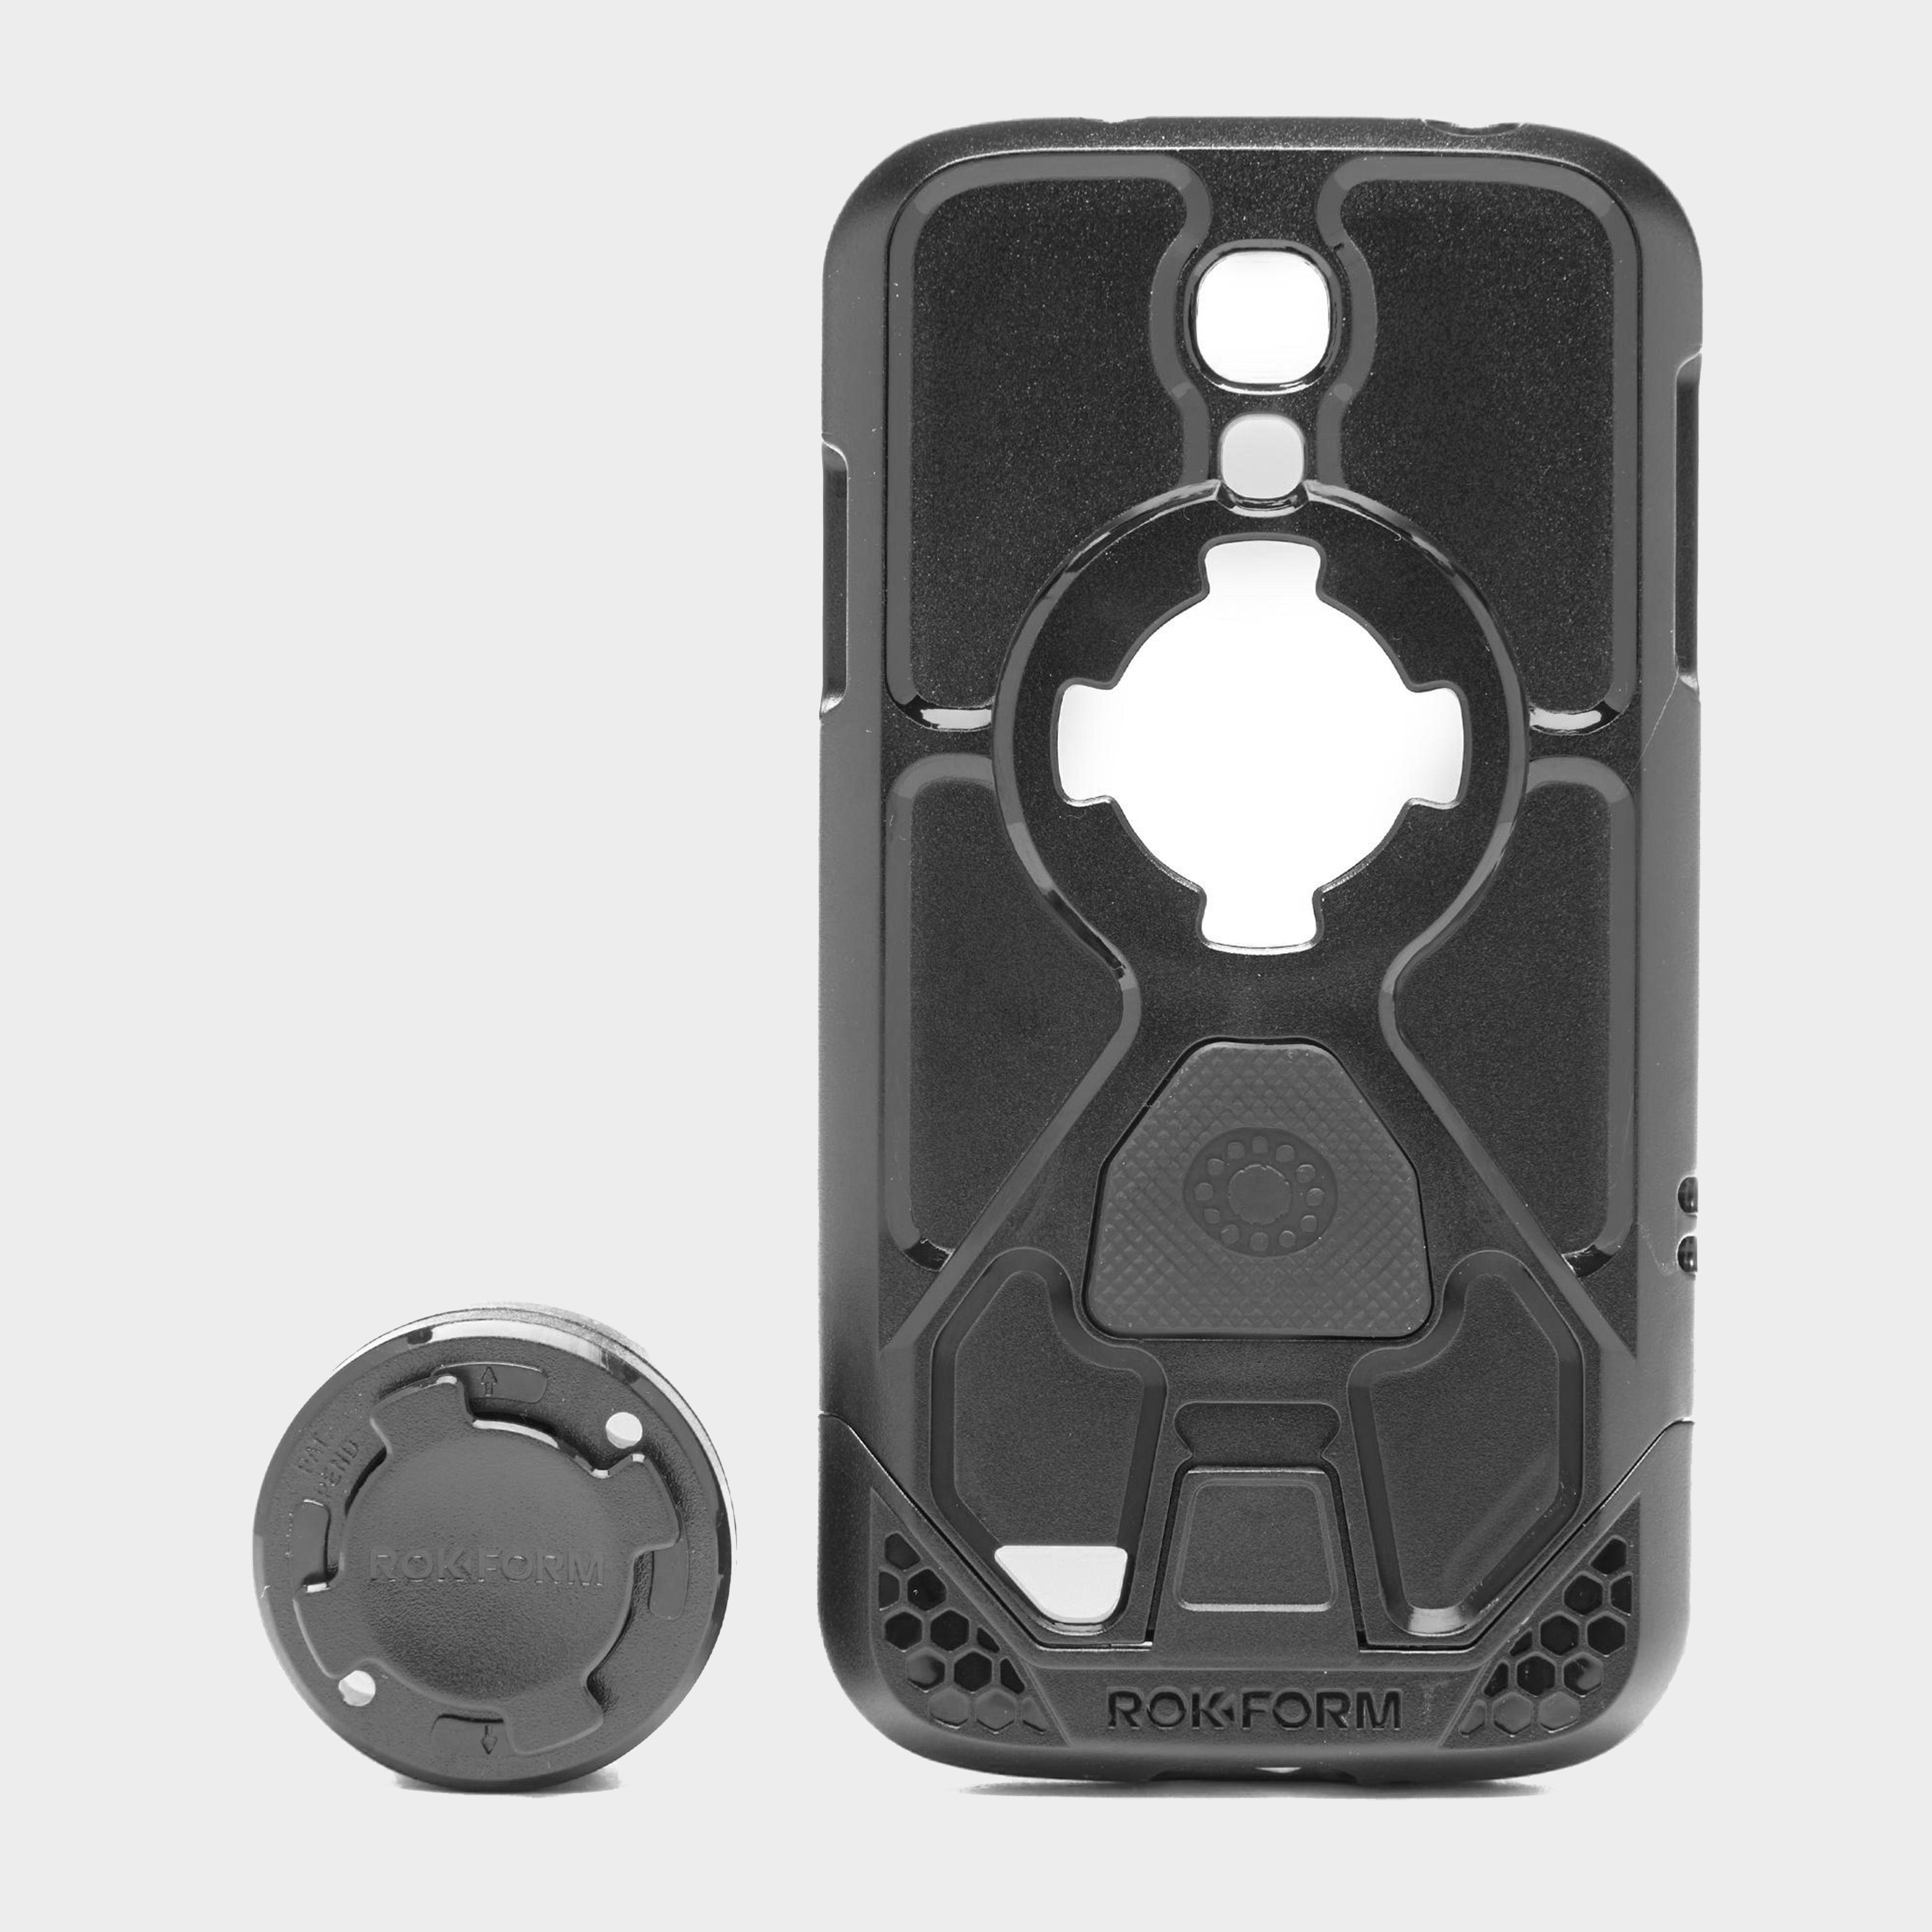 Rokform Samsung Galaxy S4 Mountable Case, Black